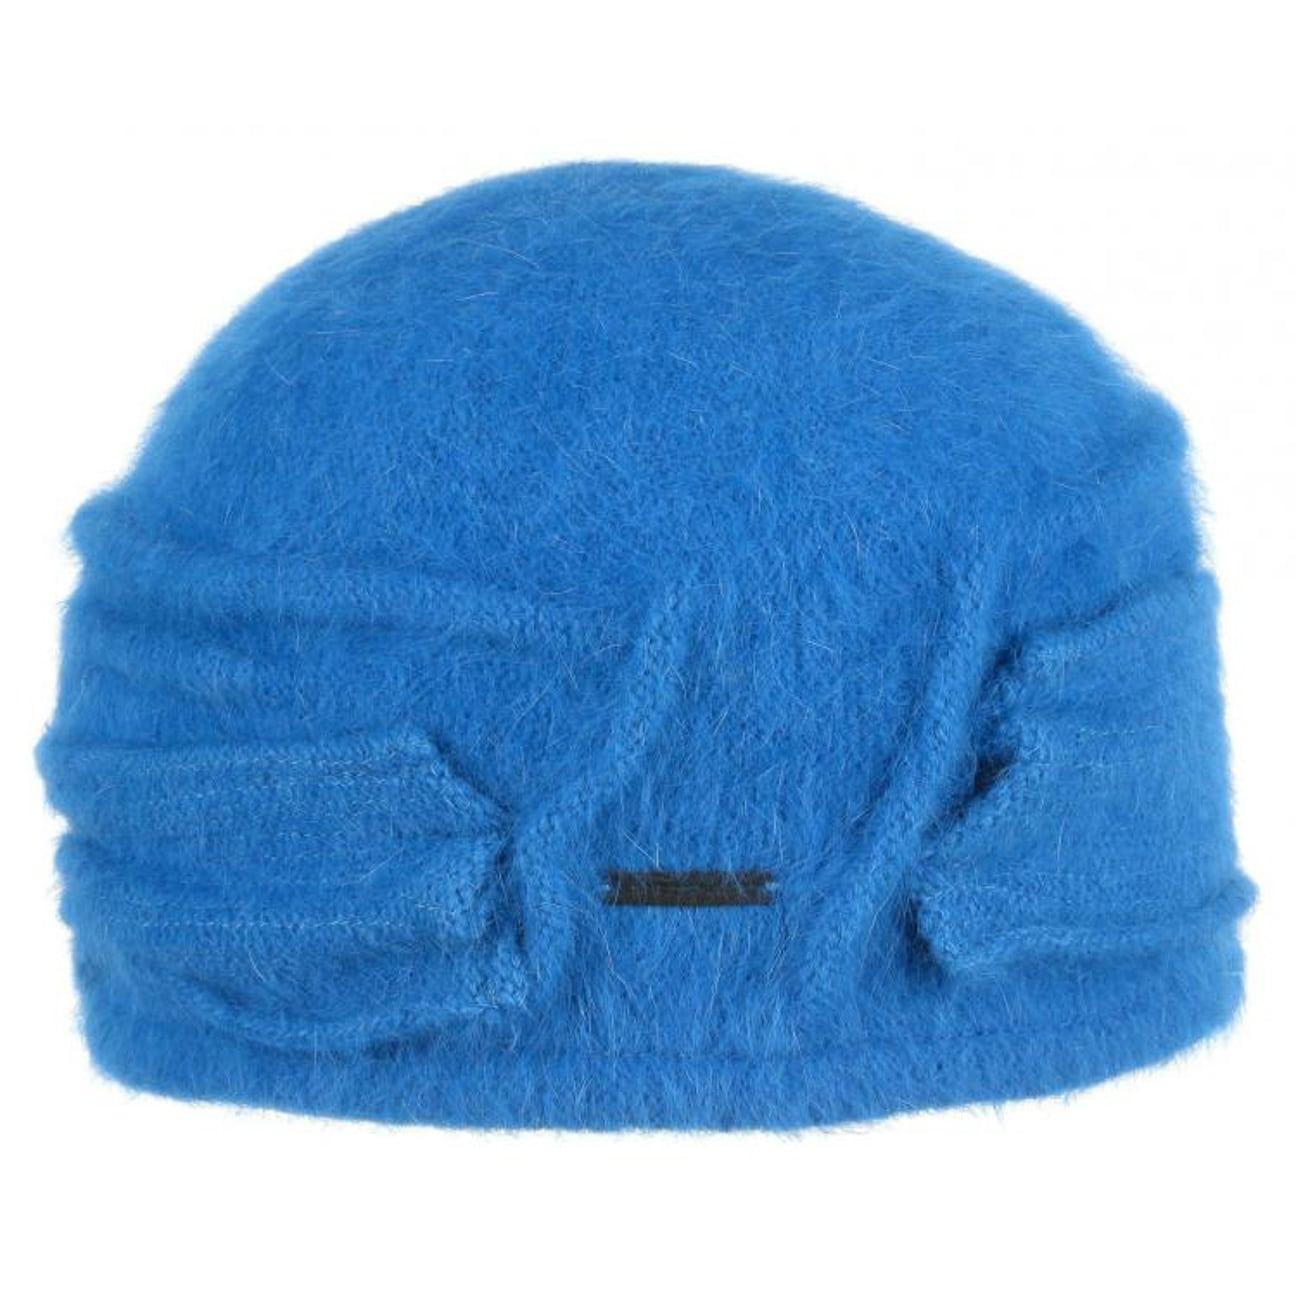 0b4a24f9e4e Nakiska Angora Toque Hat by Seeberger - blue 1 ...